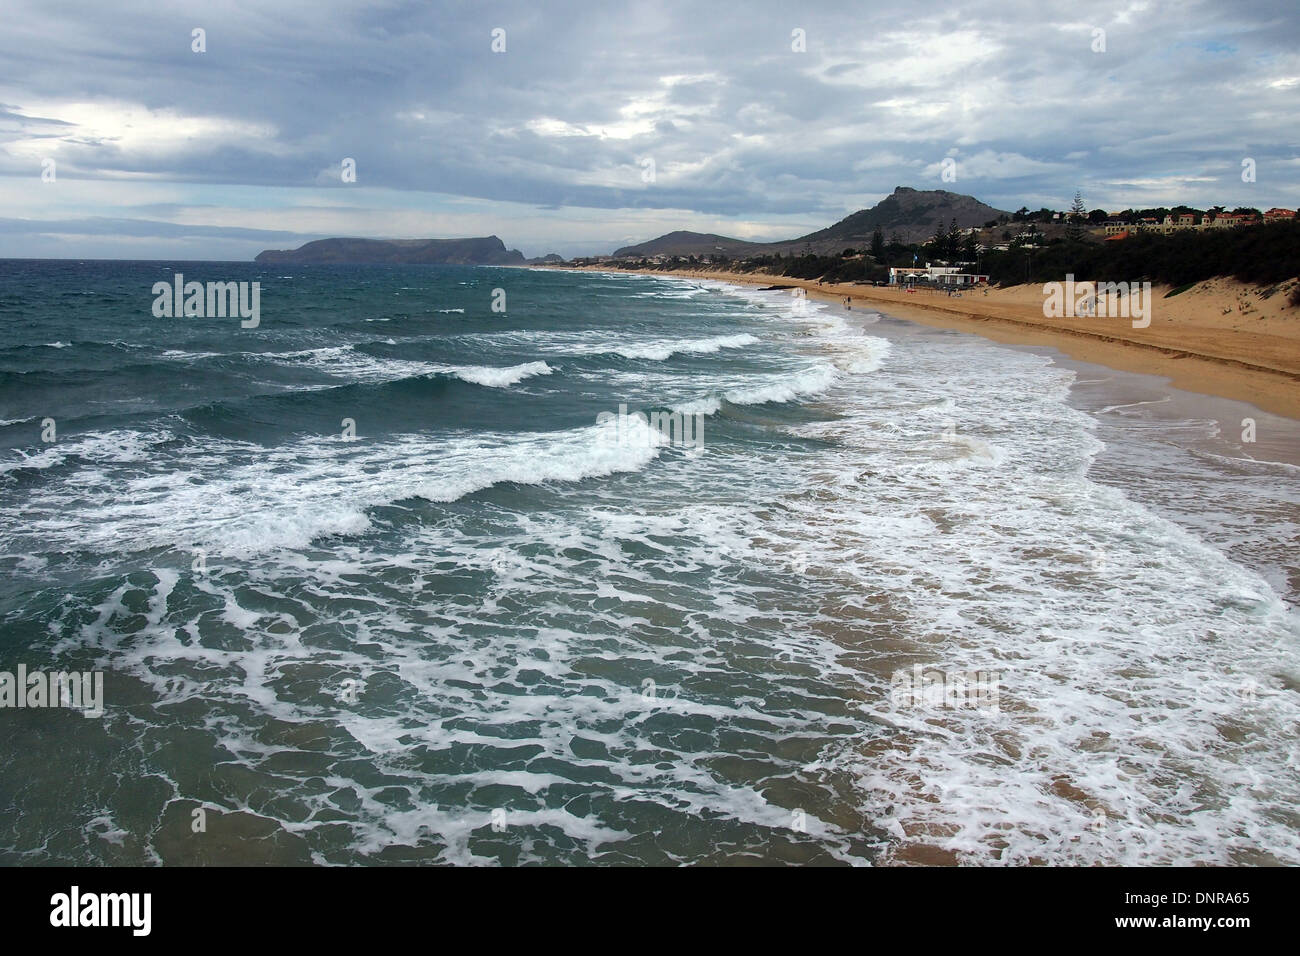 The famous beach on the Atlantic Island of Porto Santo near Madeira - Stock Image